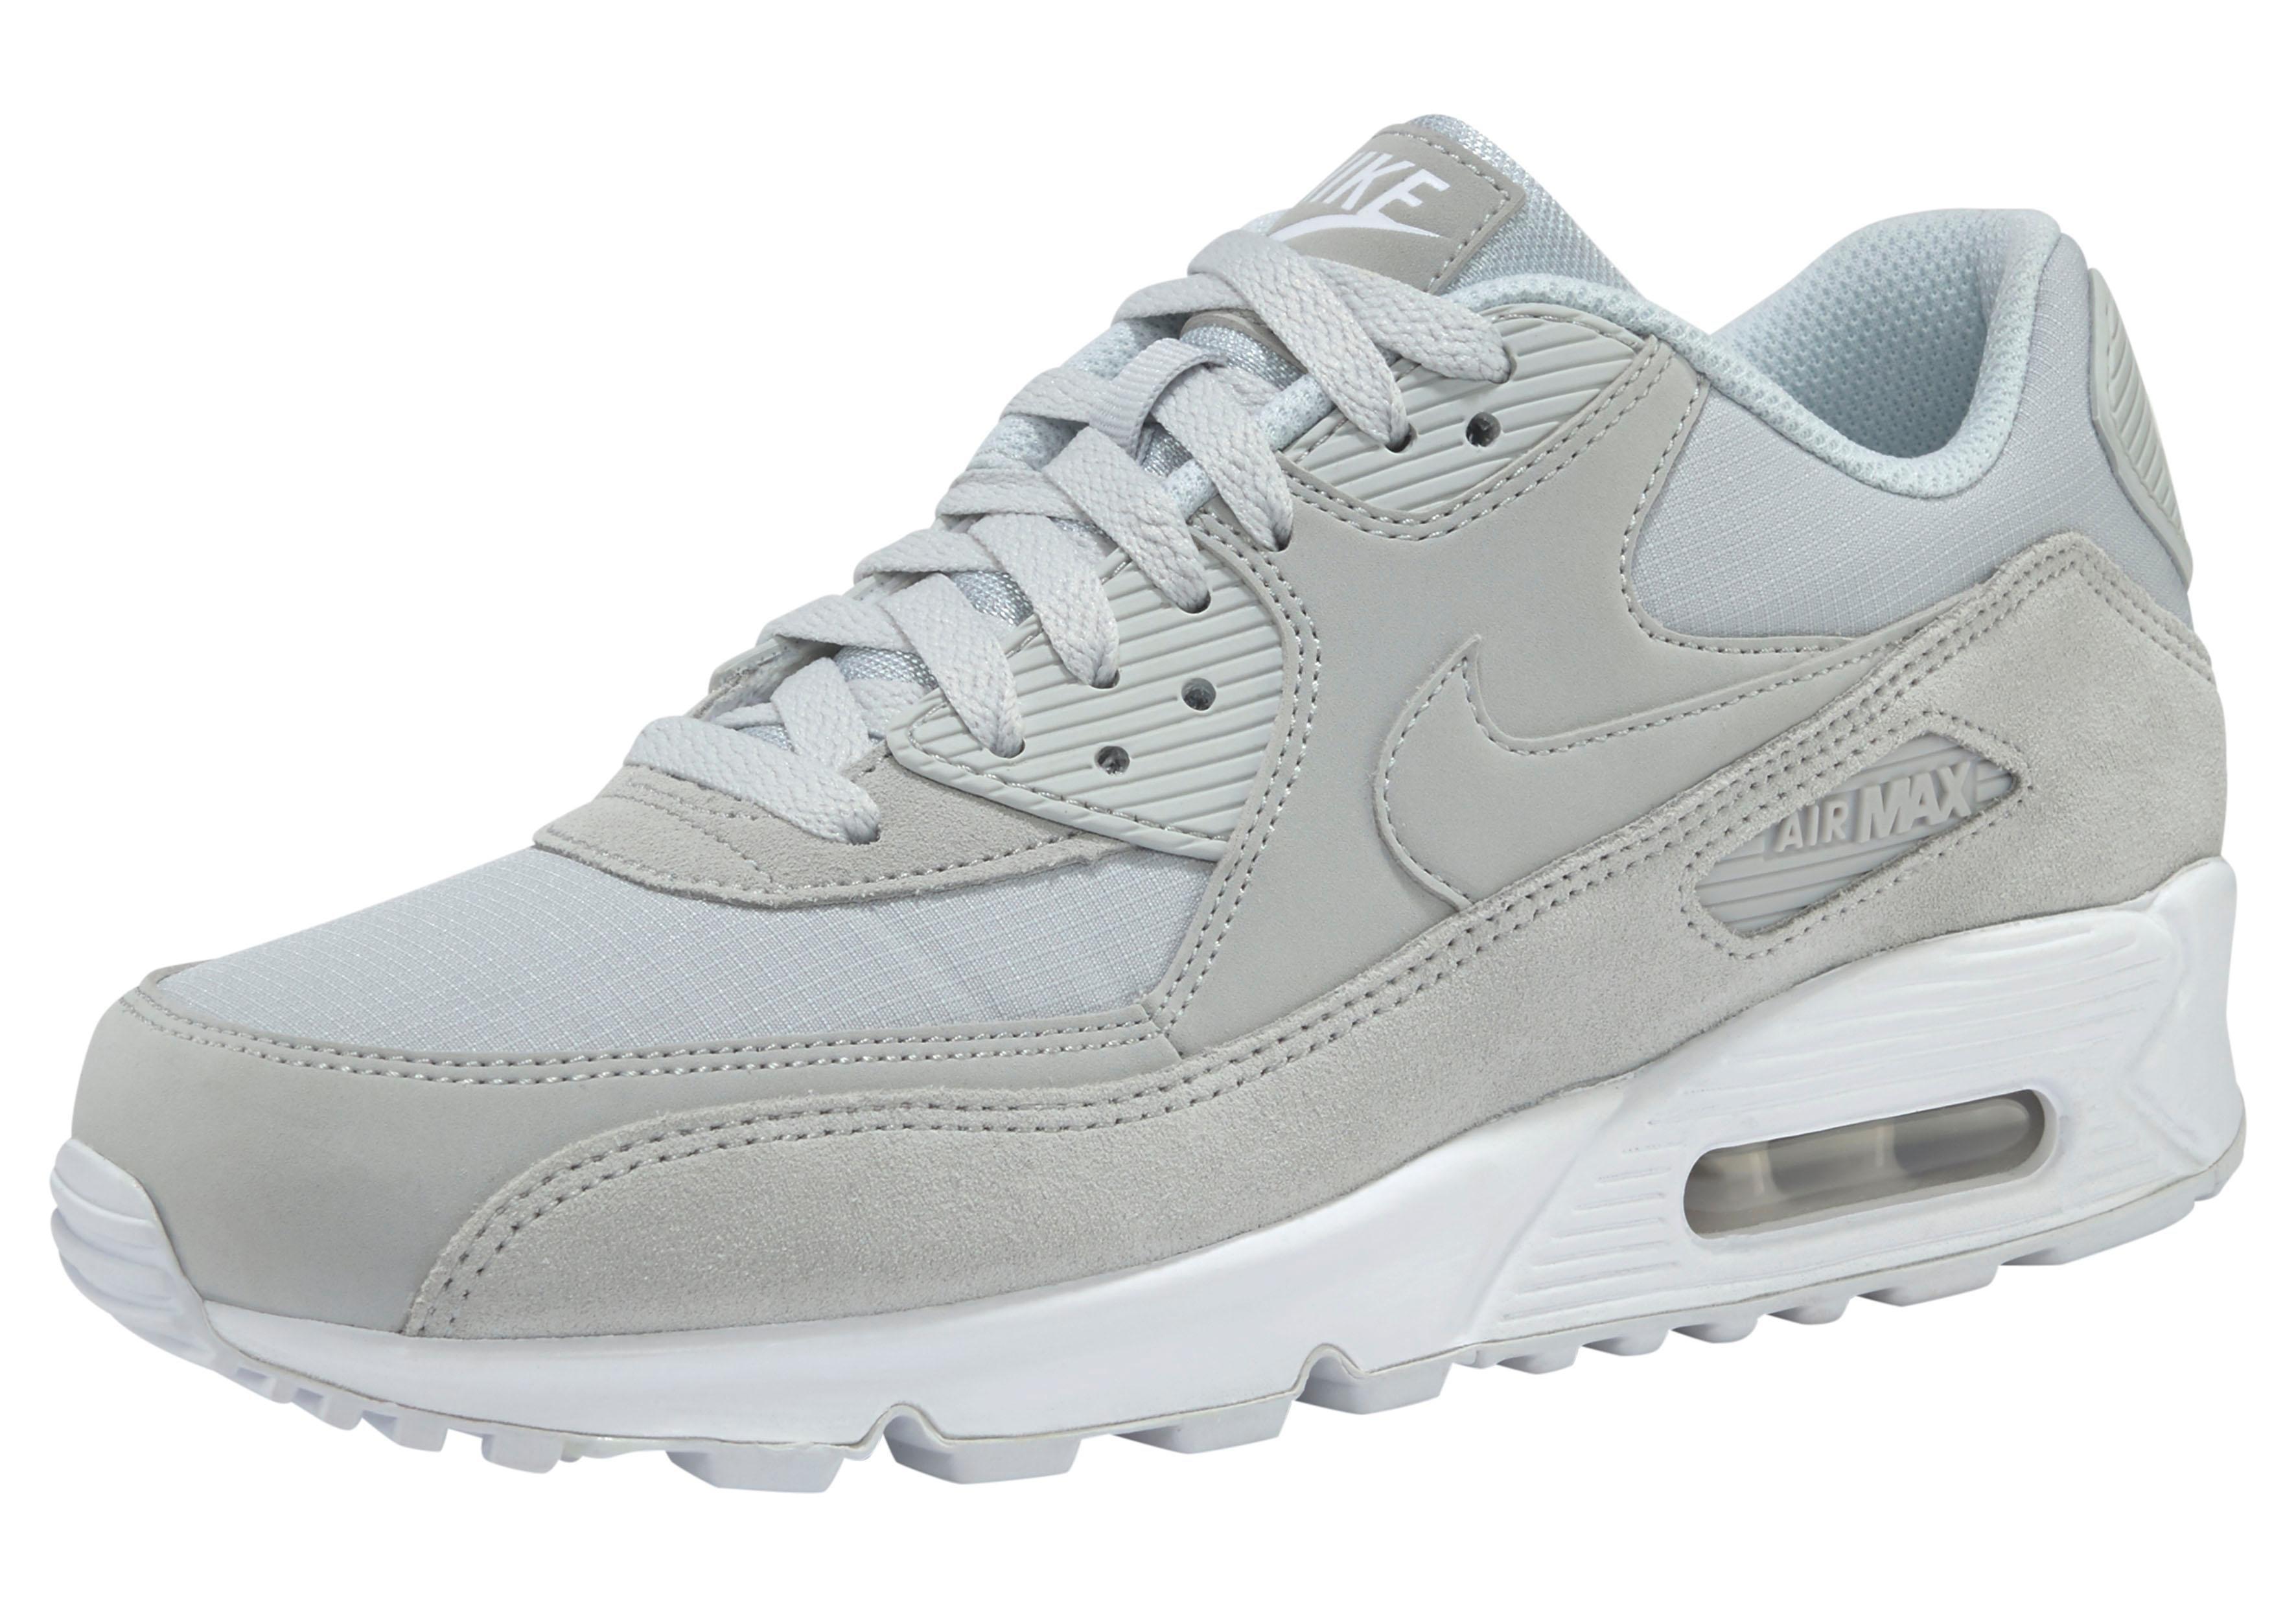 new style 886a1 0ea04 Afbeeldingsbron Nike Sportswear sneakers »Air Max 90 Essential«